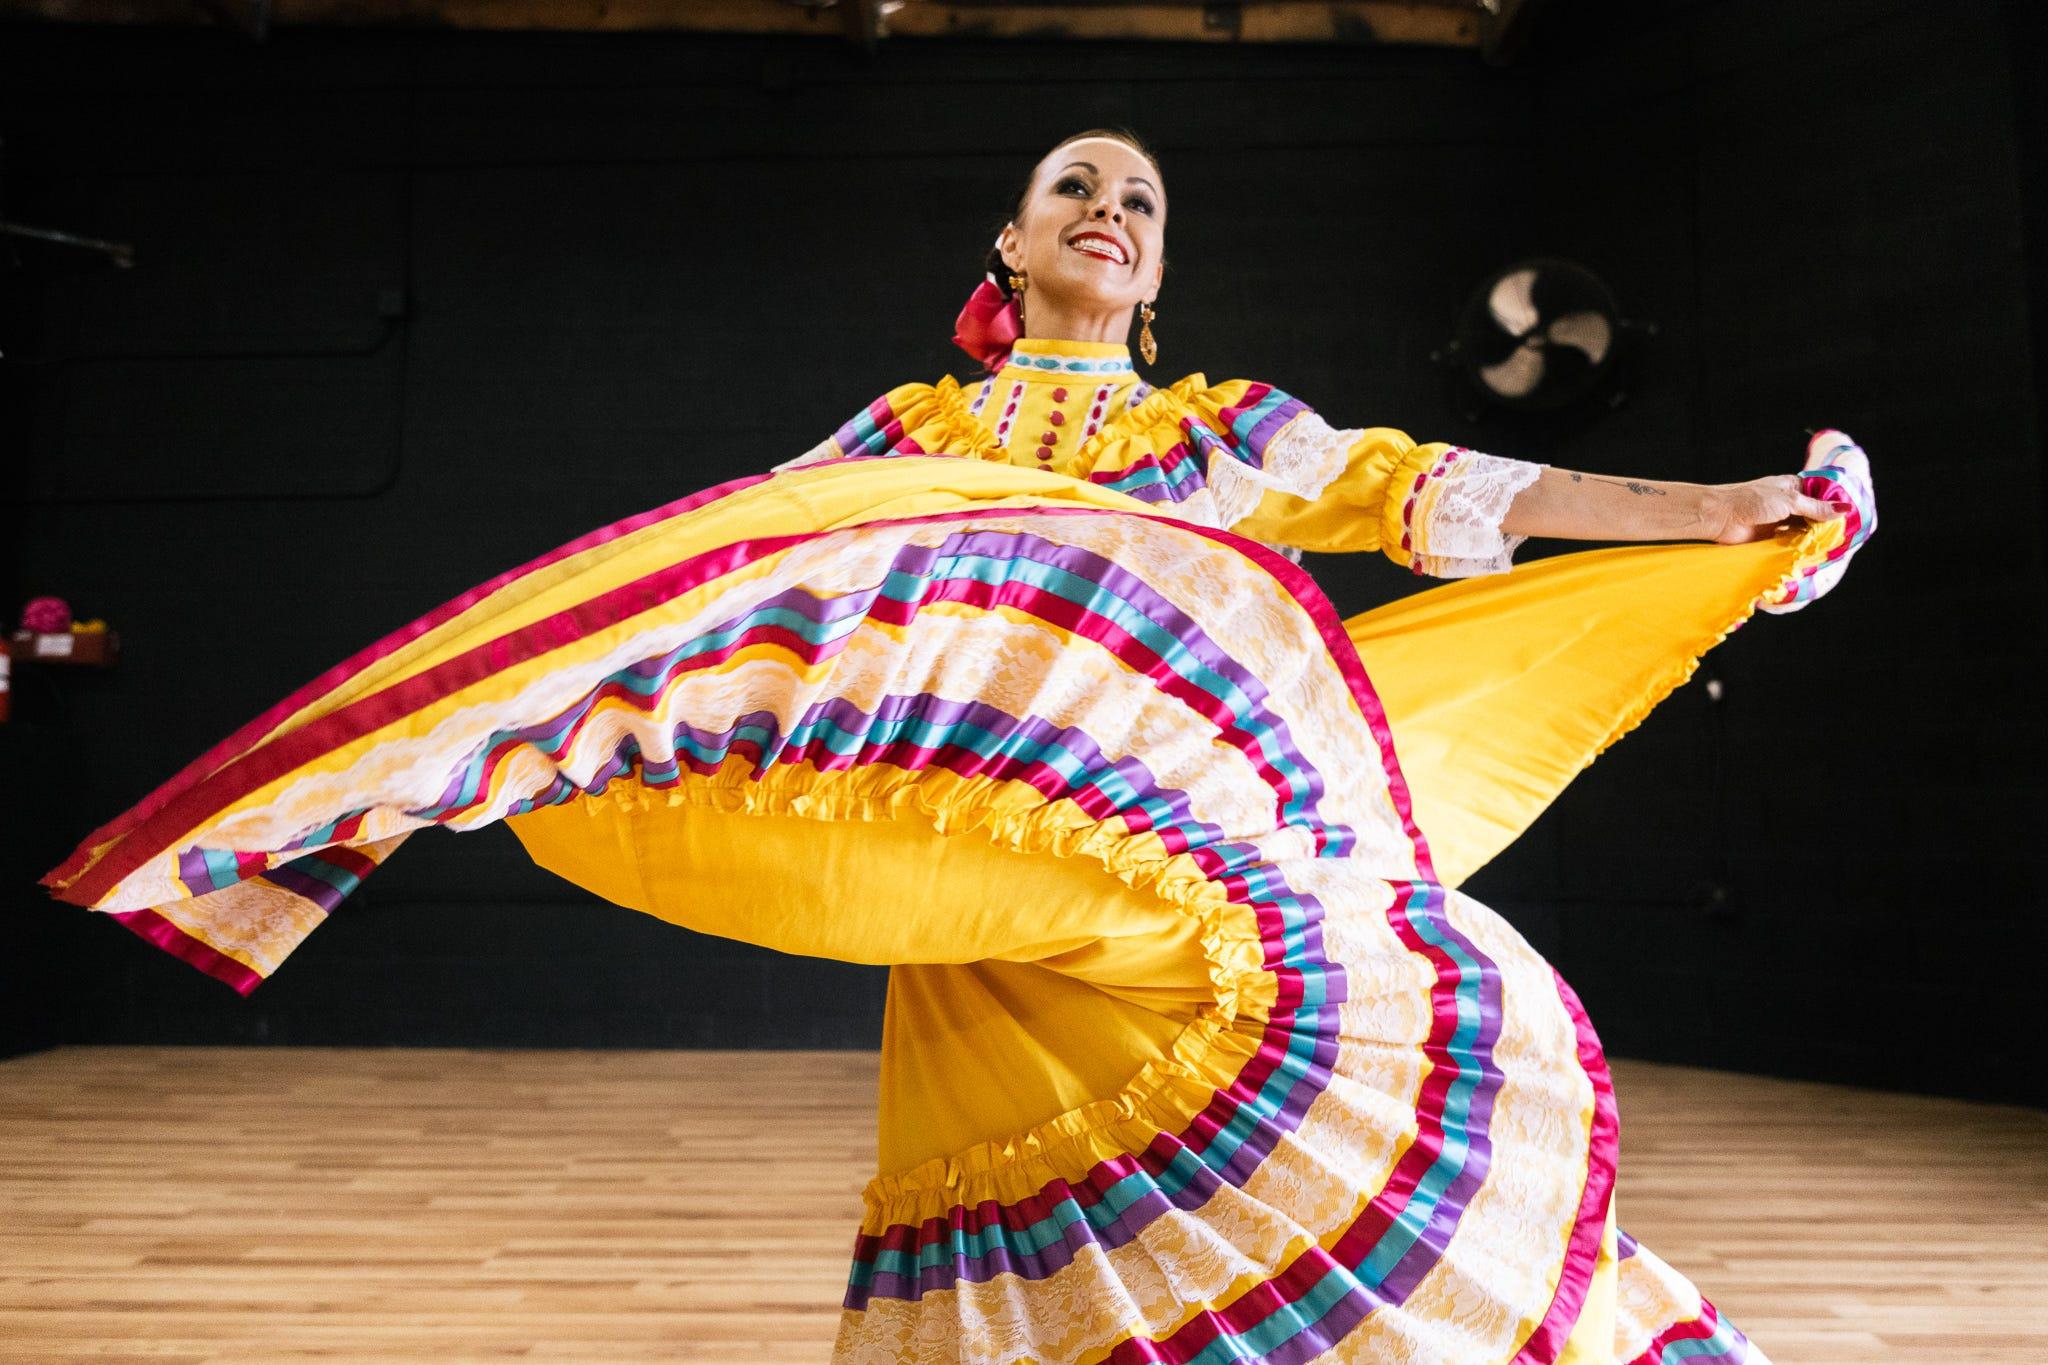 Vanessa Ramírez, instructor of Ballet Folklórico Quetzalli in Chandler, has been teaching the dance for decades.